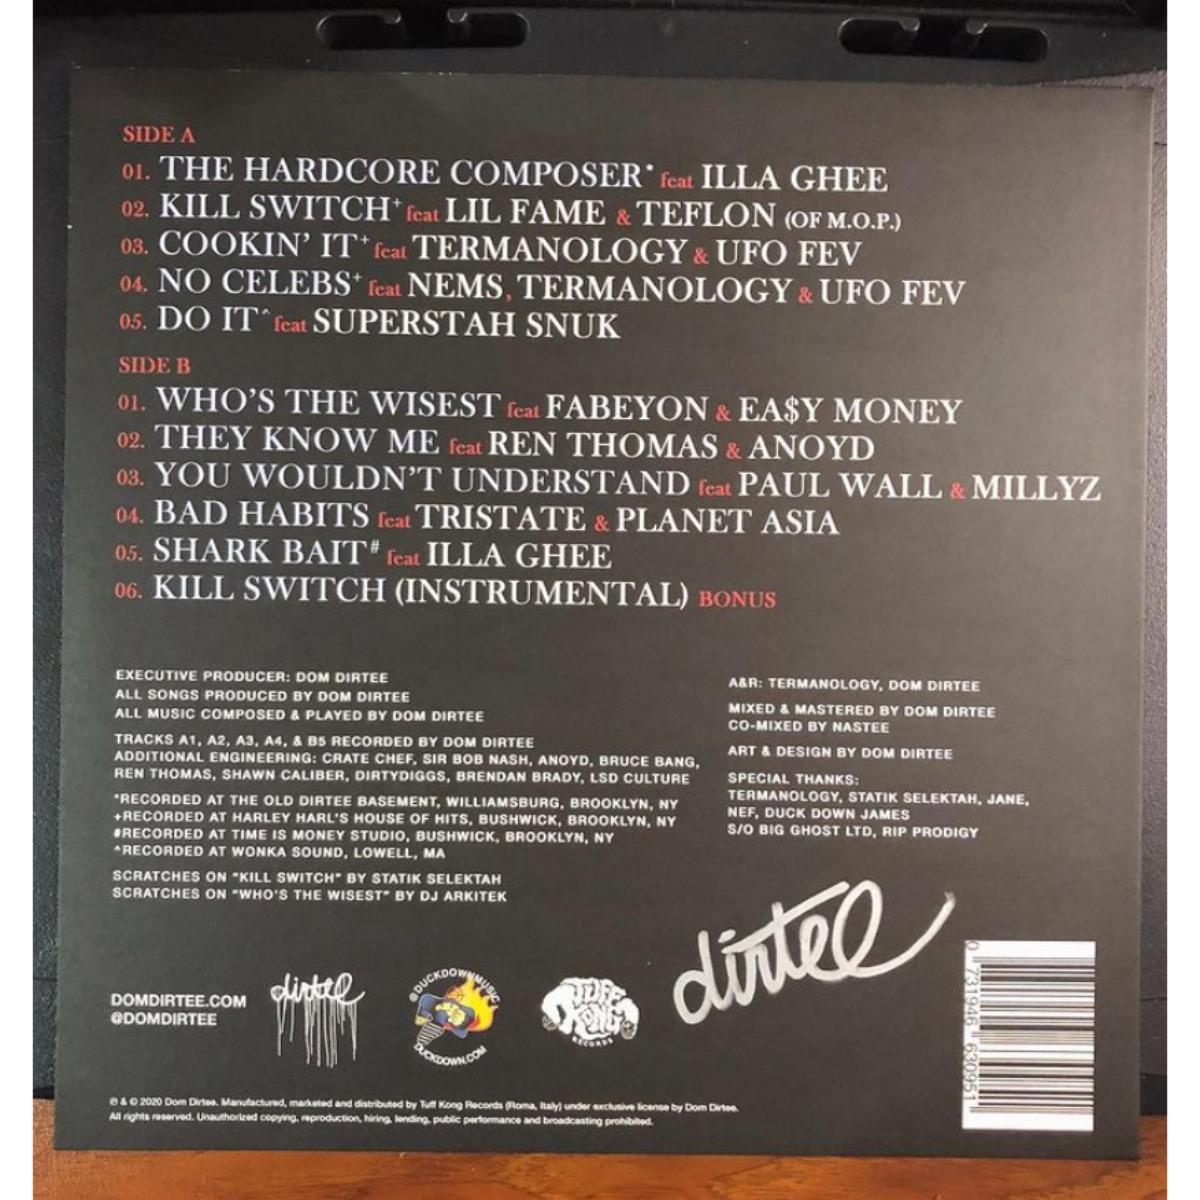 Dom Dirtee's The Hardcore Composer Signed Vinyl